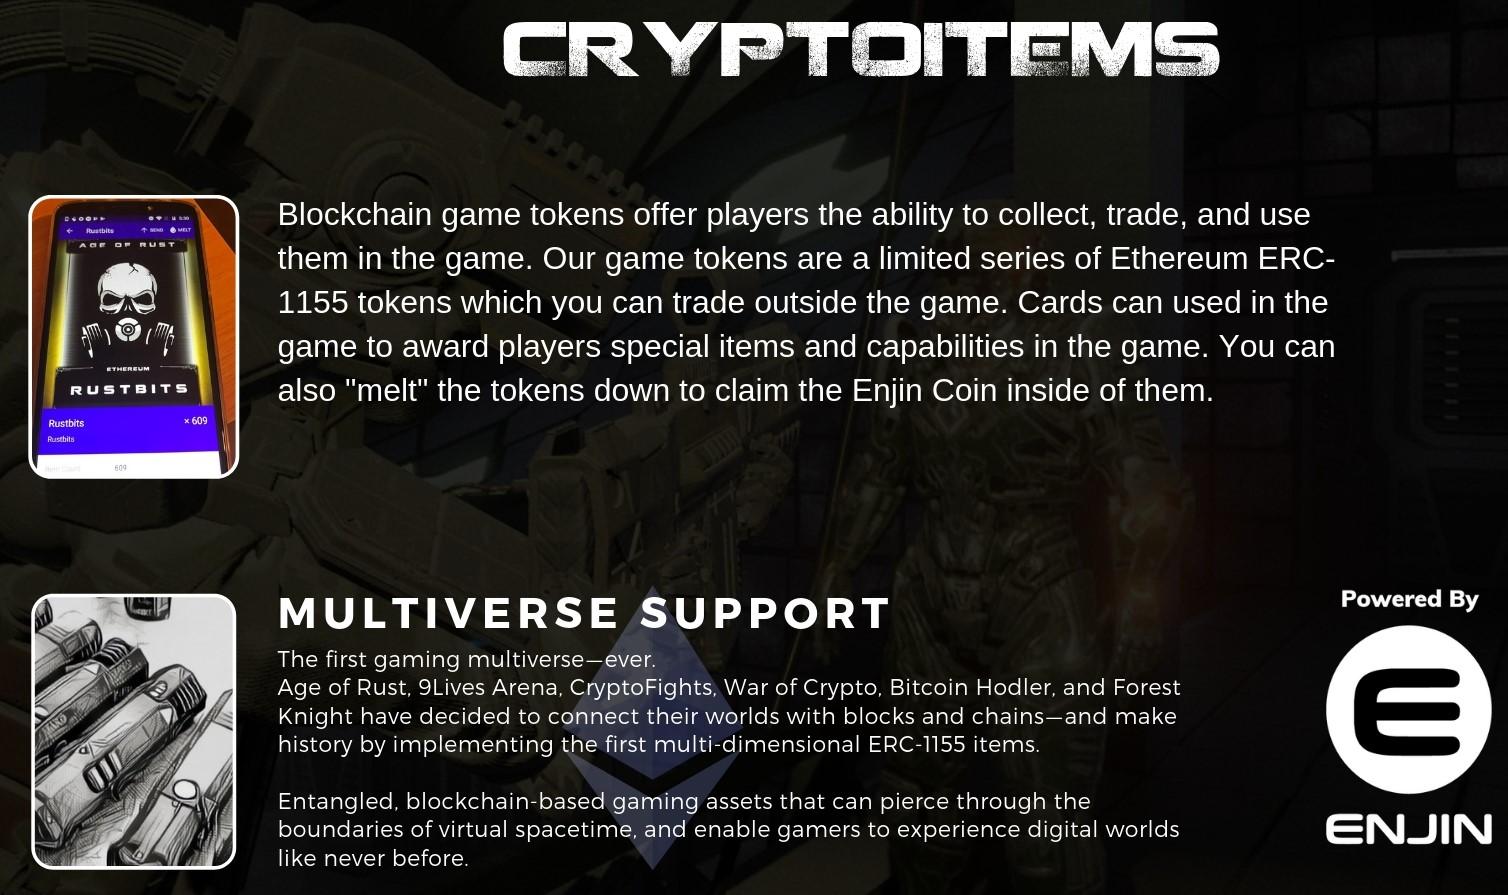 CRYPTOITEMS.jpg